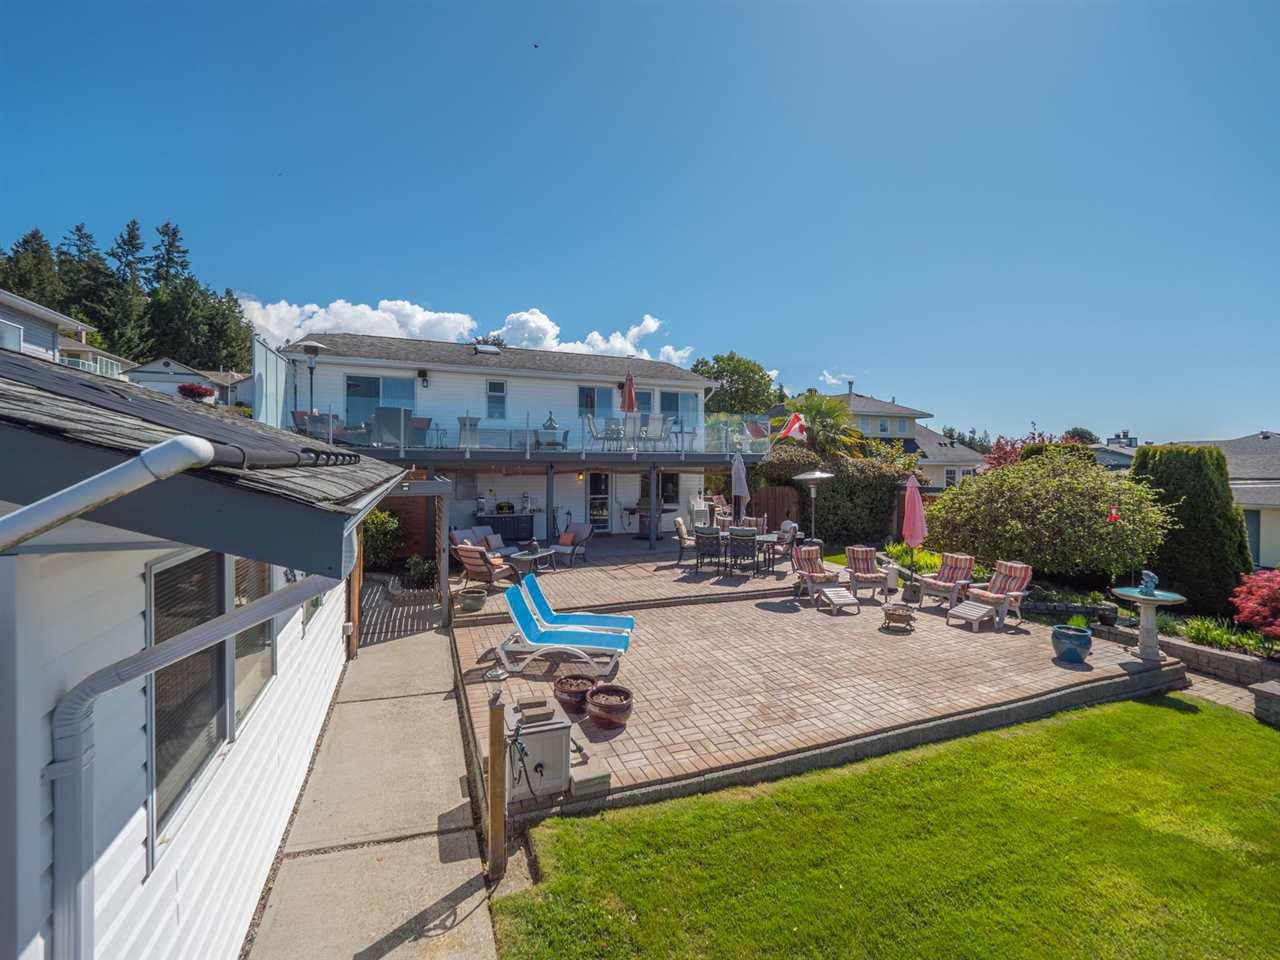 Photo 18: Photos: 4983 ARBUTUS Road in Sechelt: Sechelt District House for sale (Sunshine Coast)  : MLS®# R2427502